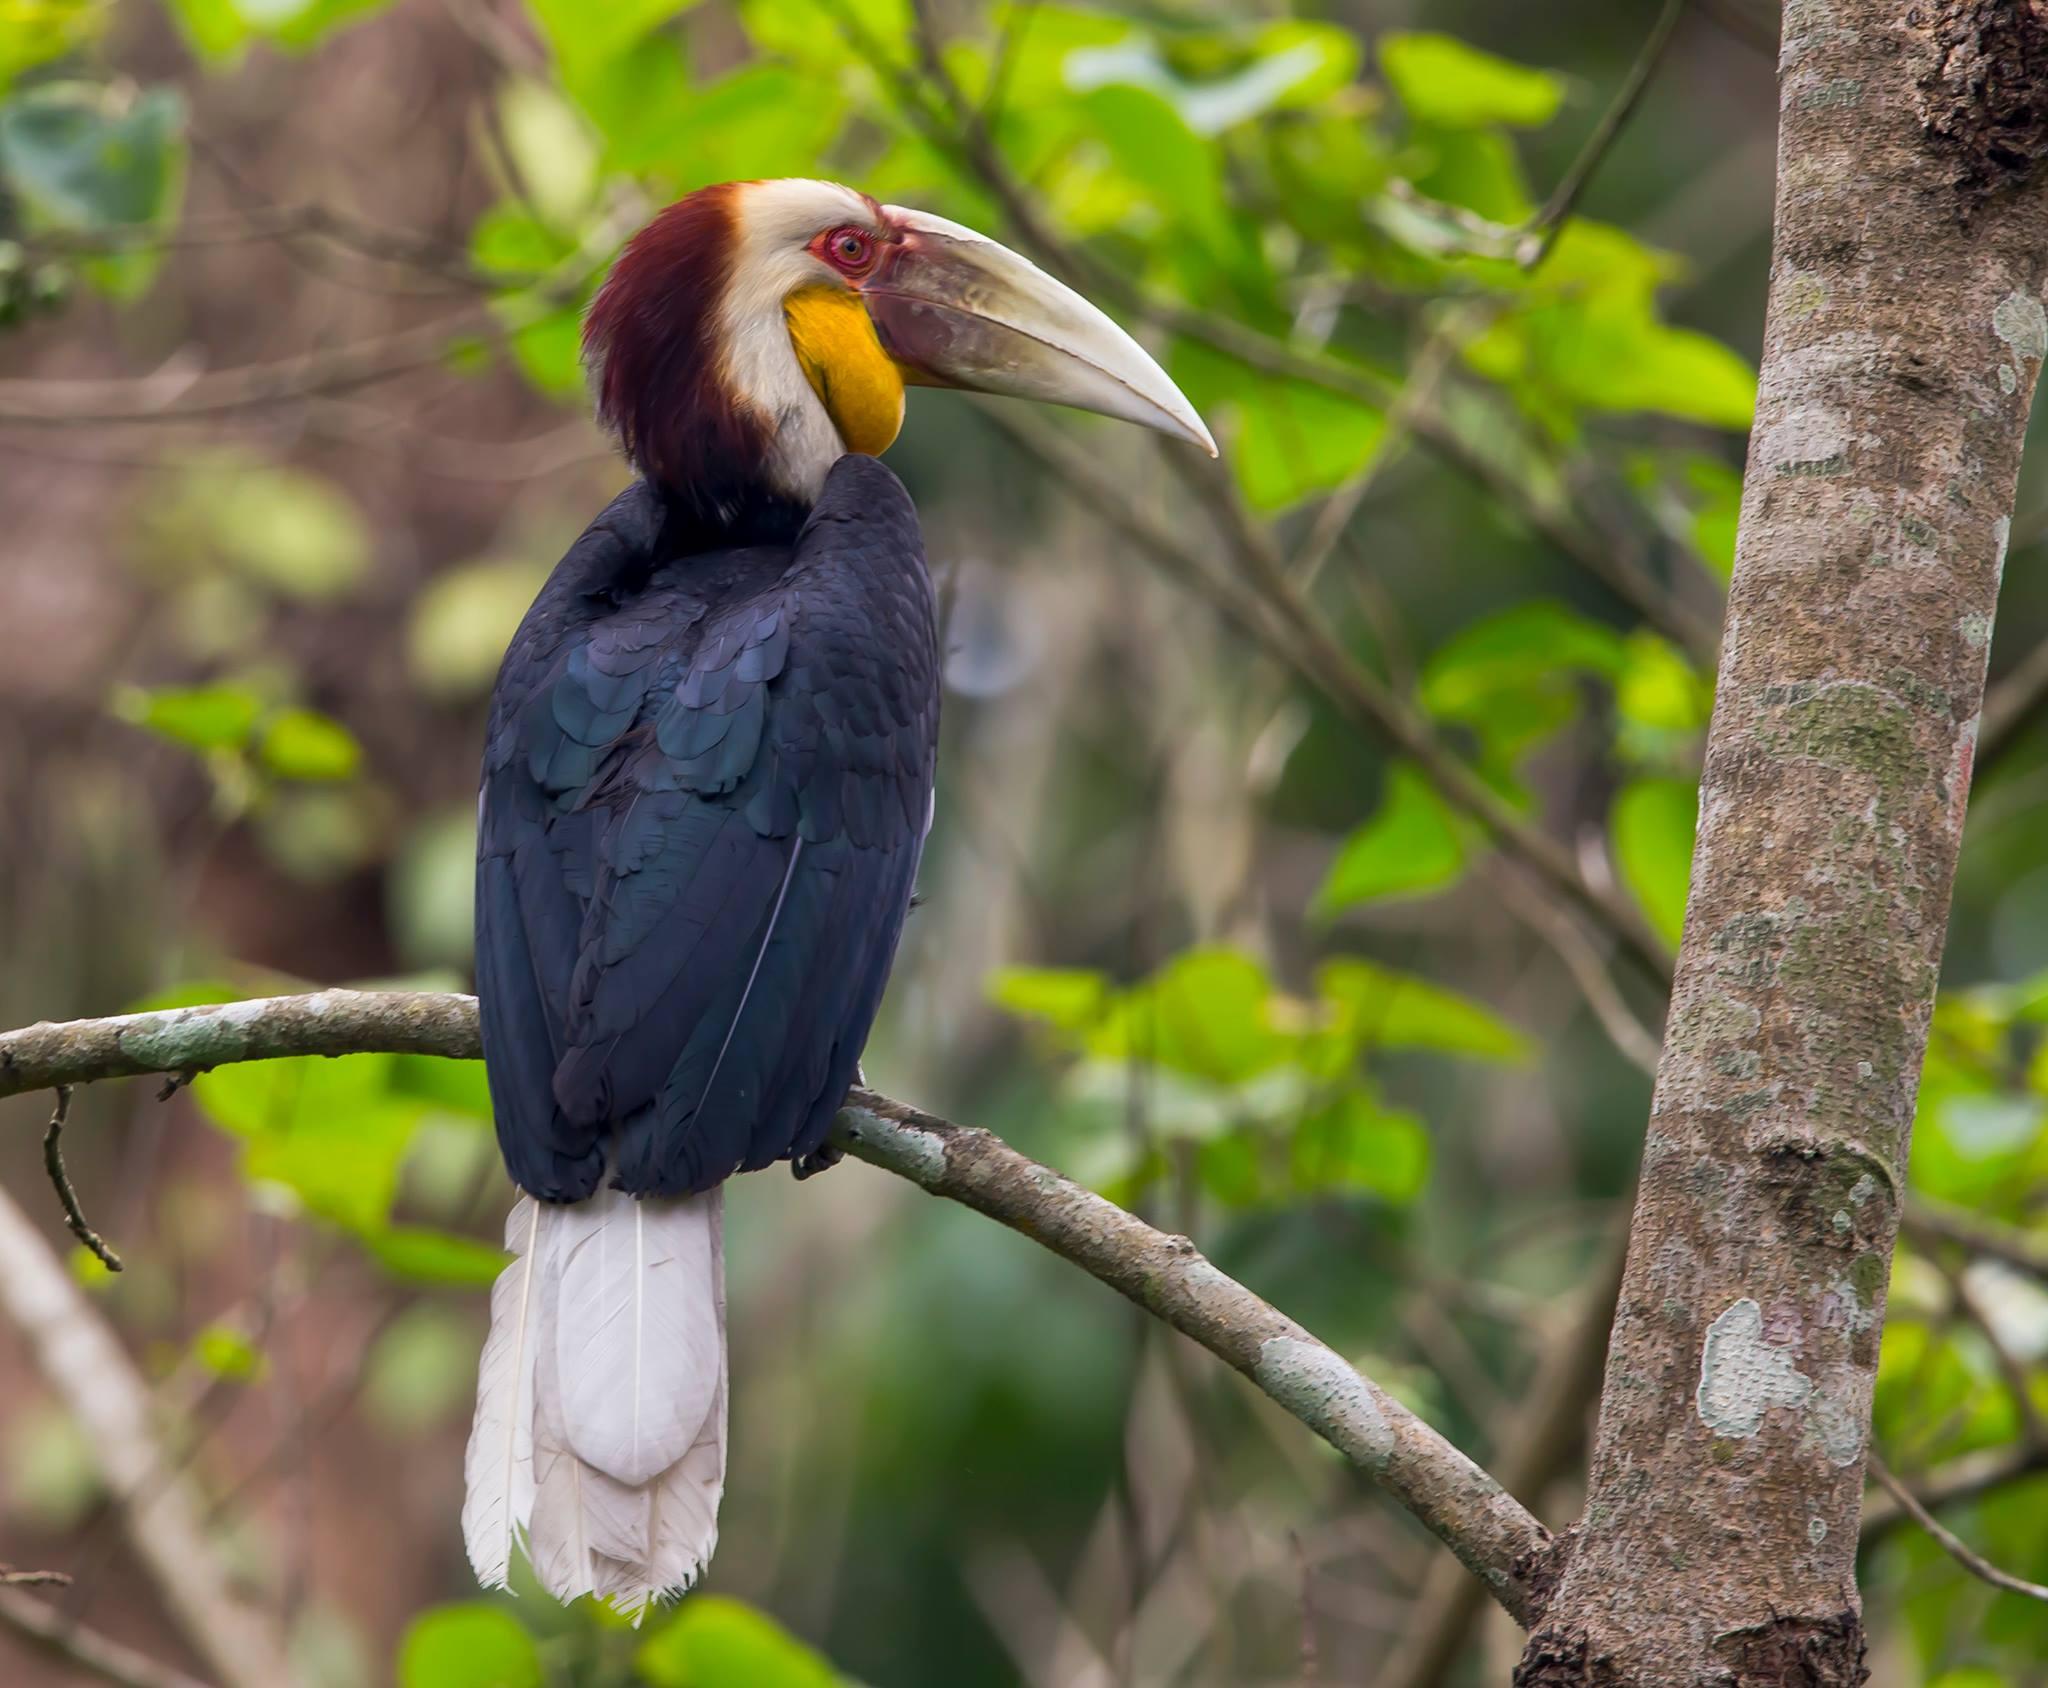 Juvenile wreathed Hornbill : Tajesh Shah